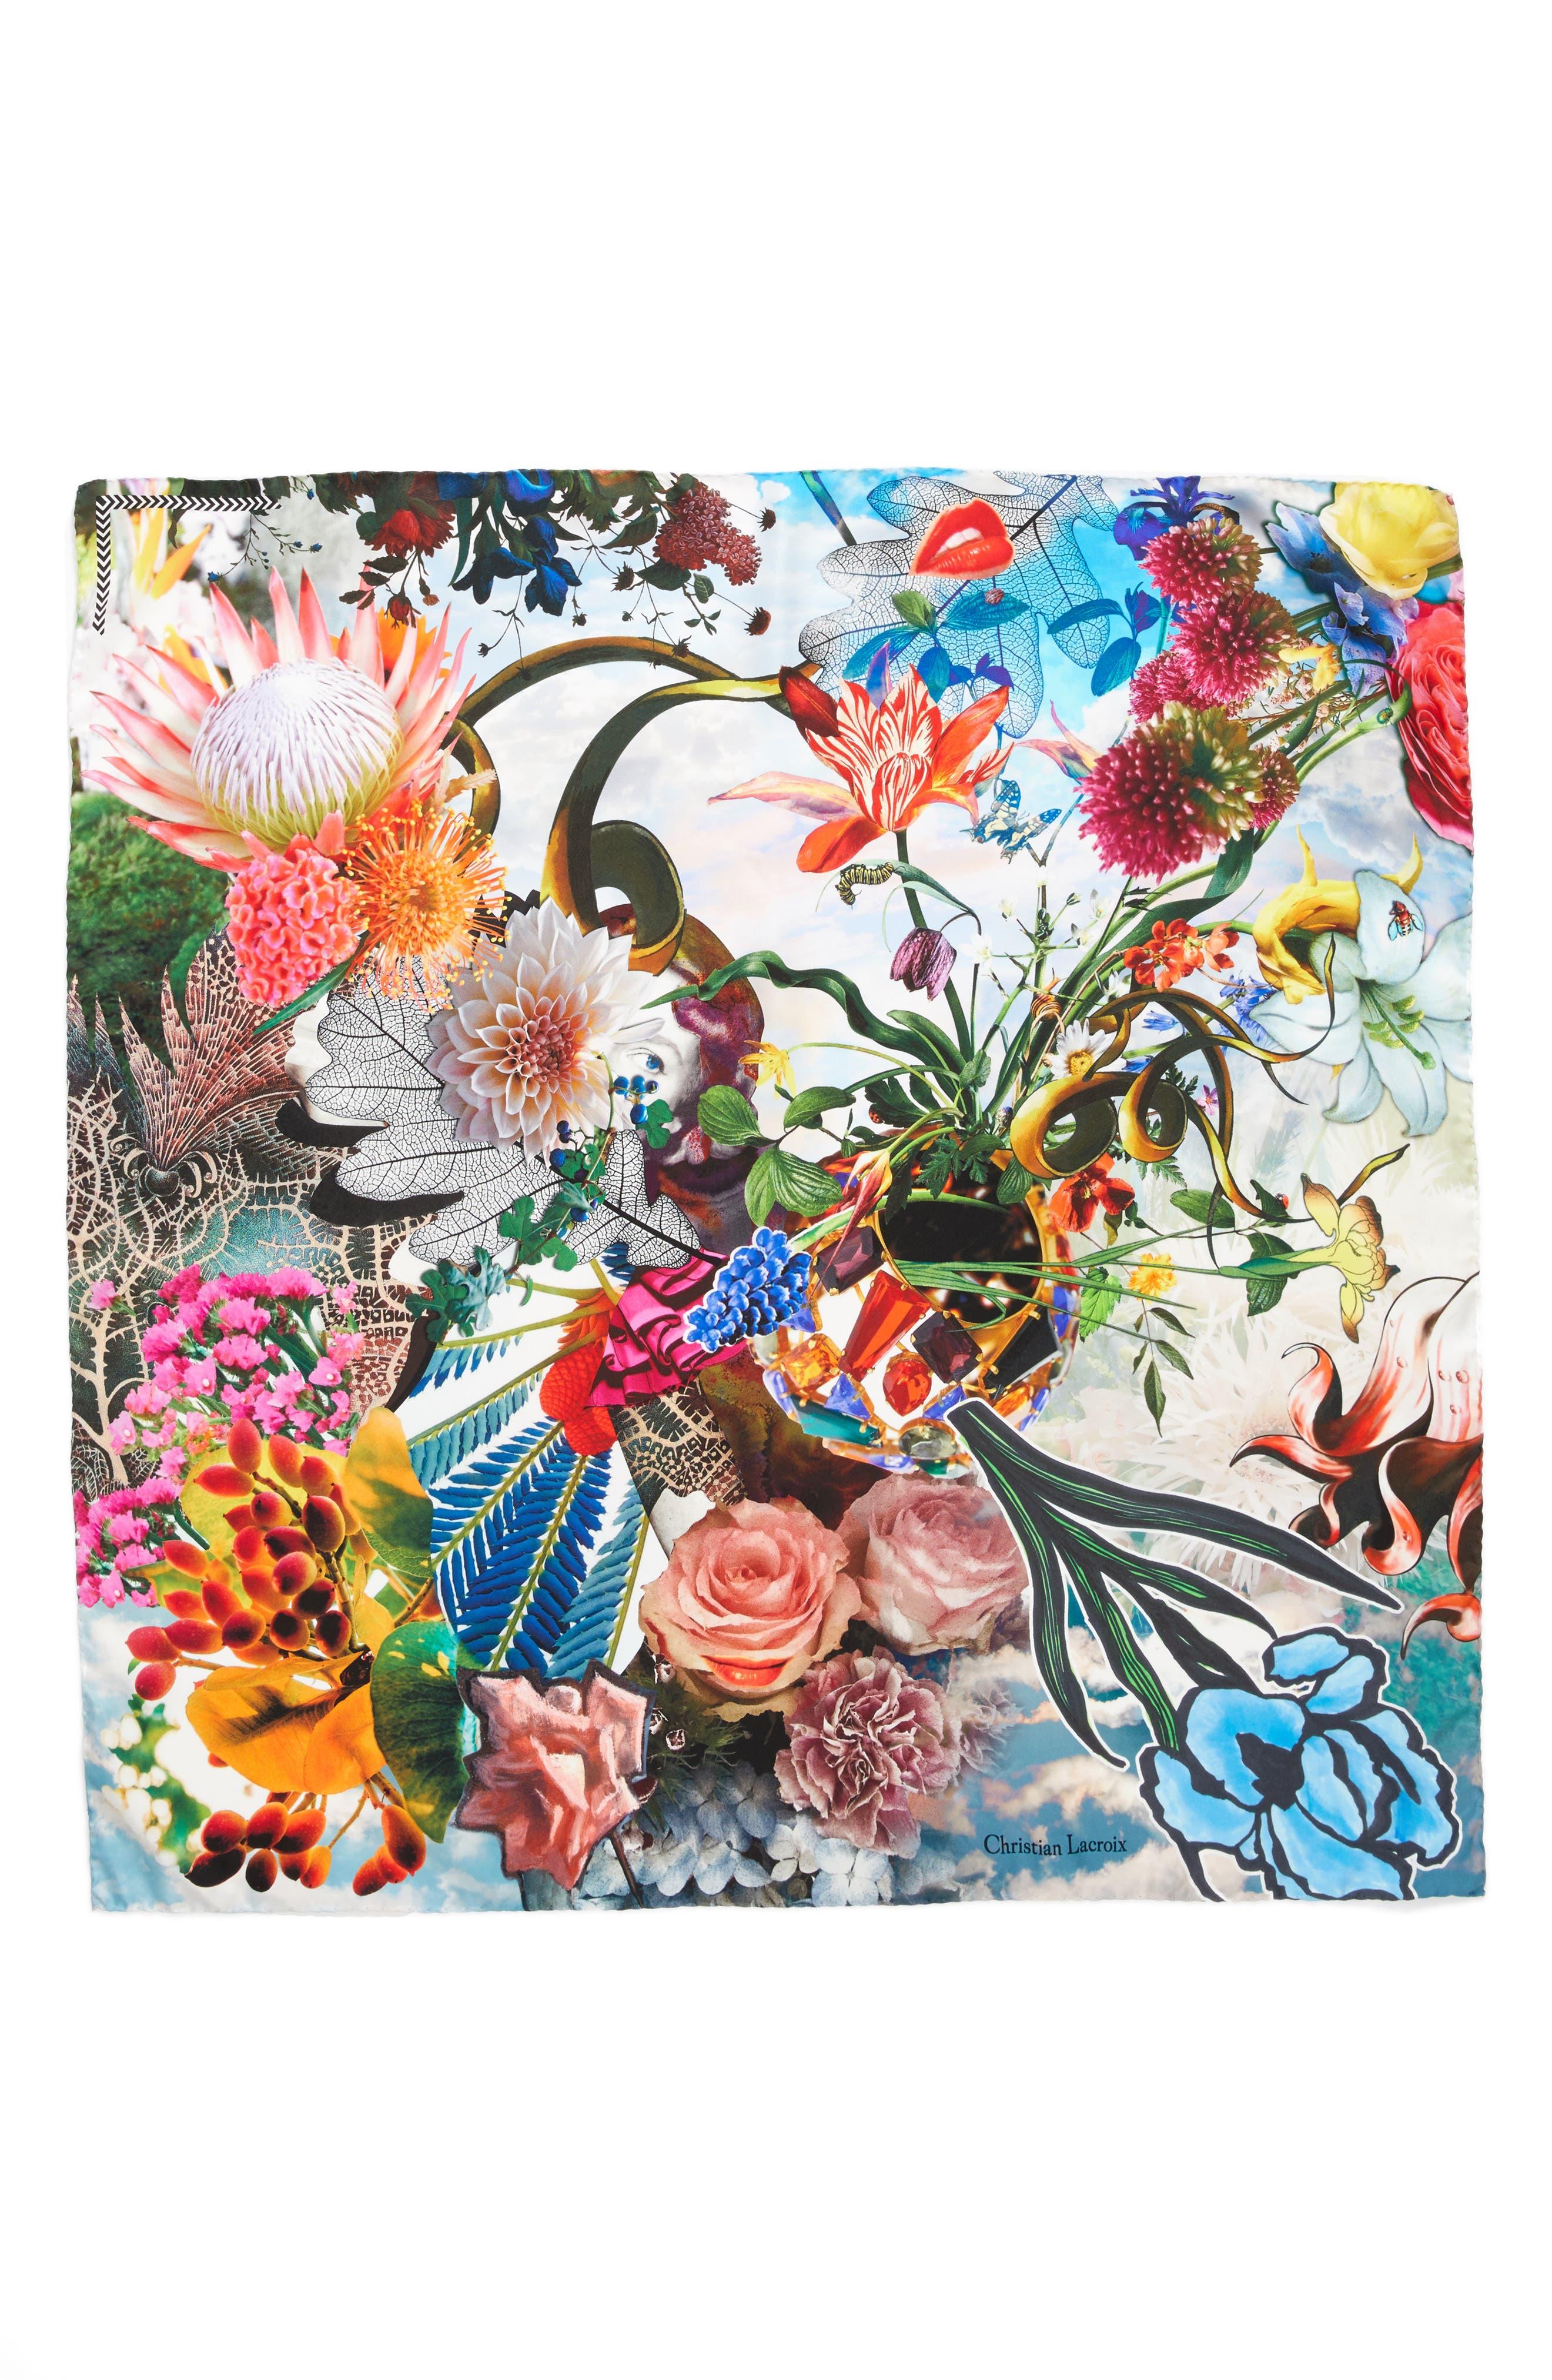 Christian Lacroix Flower Utopia Silk Square Scarf